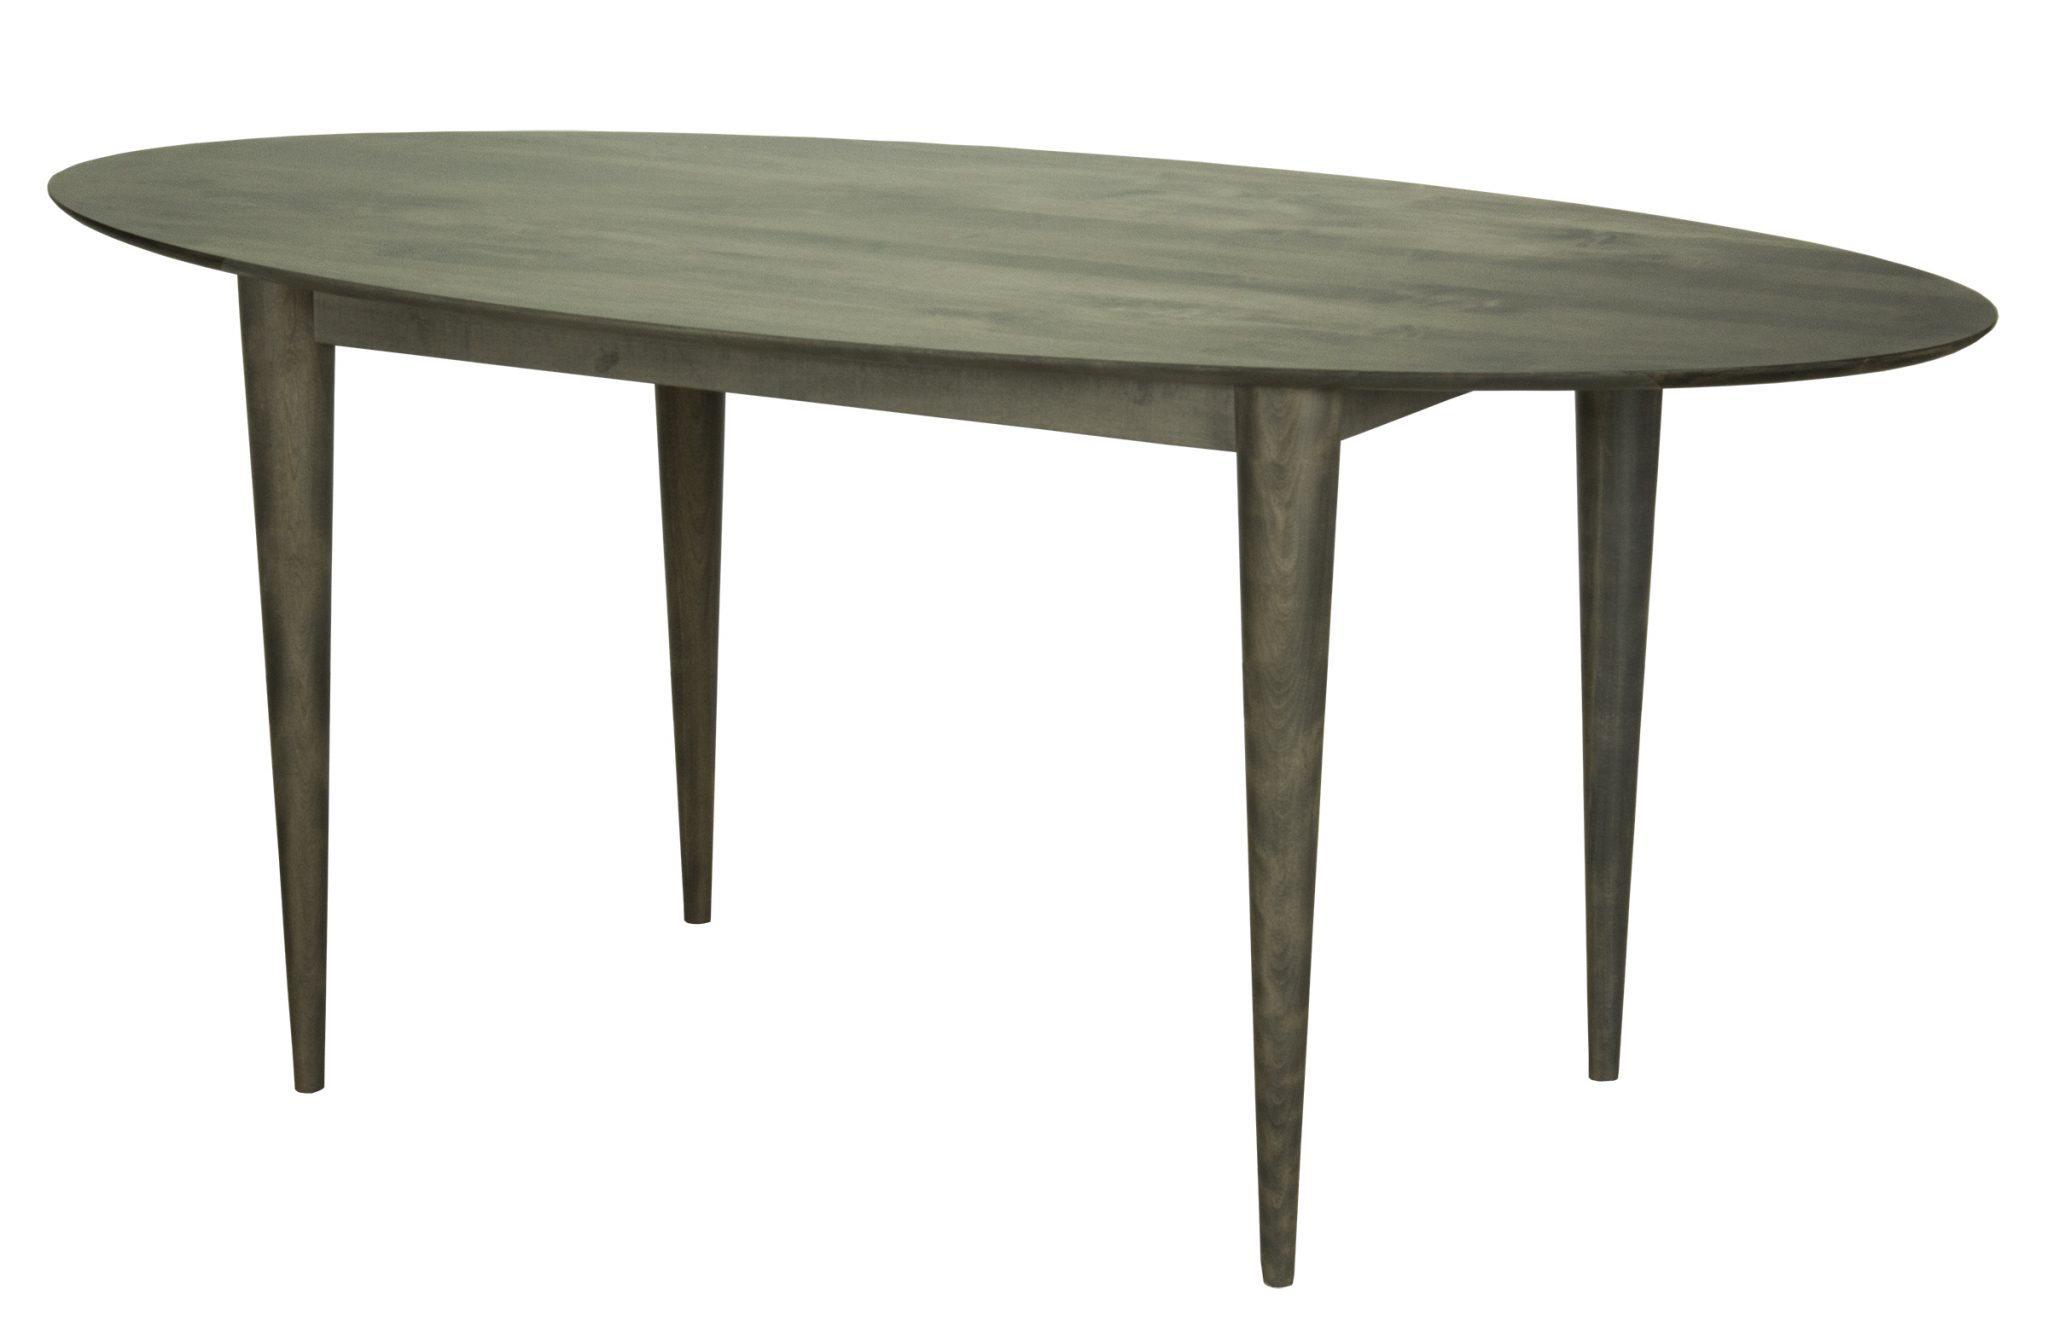 Cona Ellipse Dining Table – Saloom Furniture Company